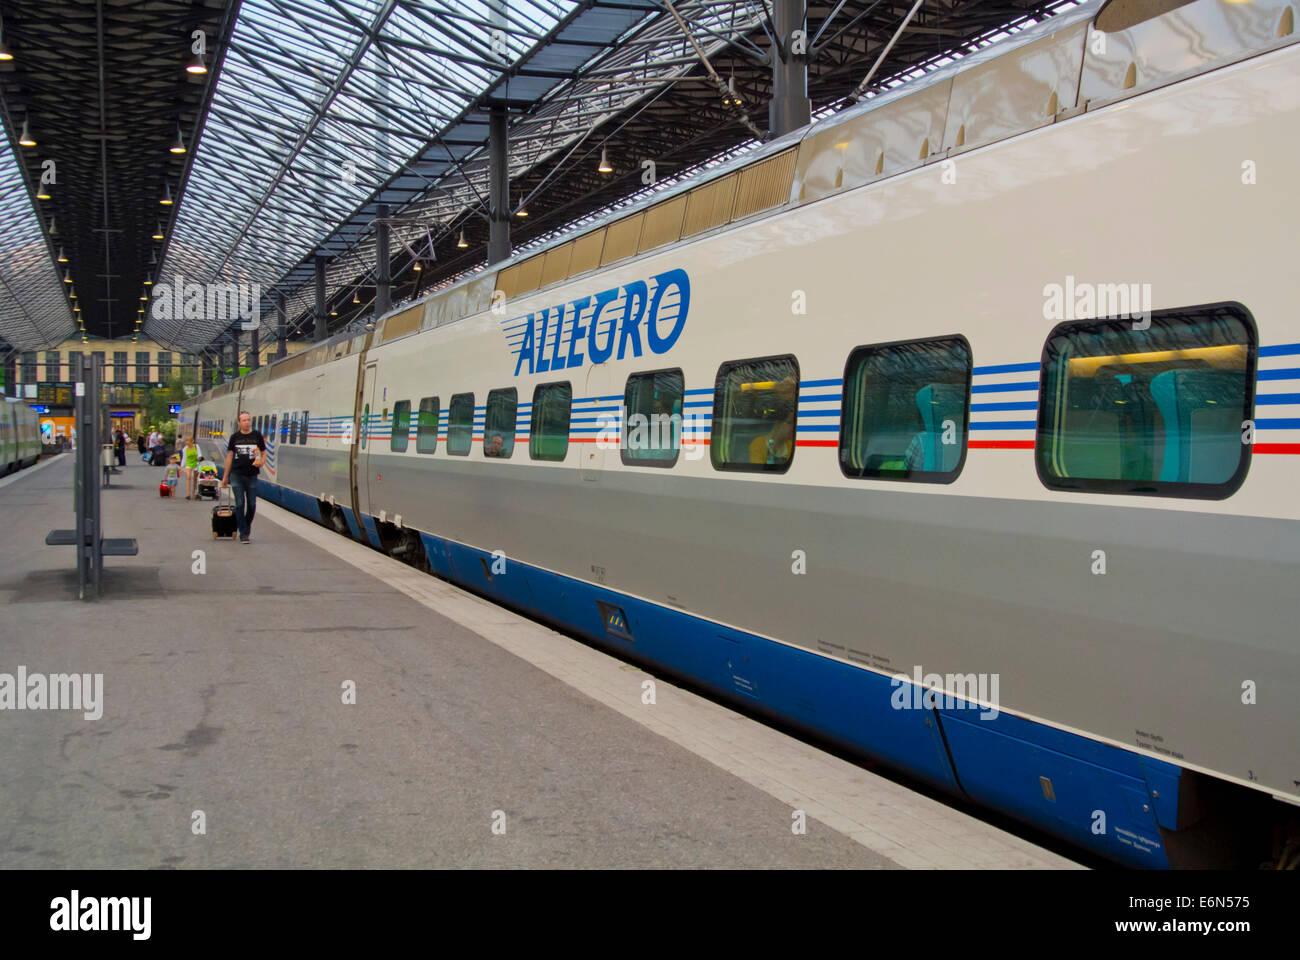 Allegro train to St Petersburg, main railway station, Helsinki, Finland, Europe - Stock Image